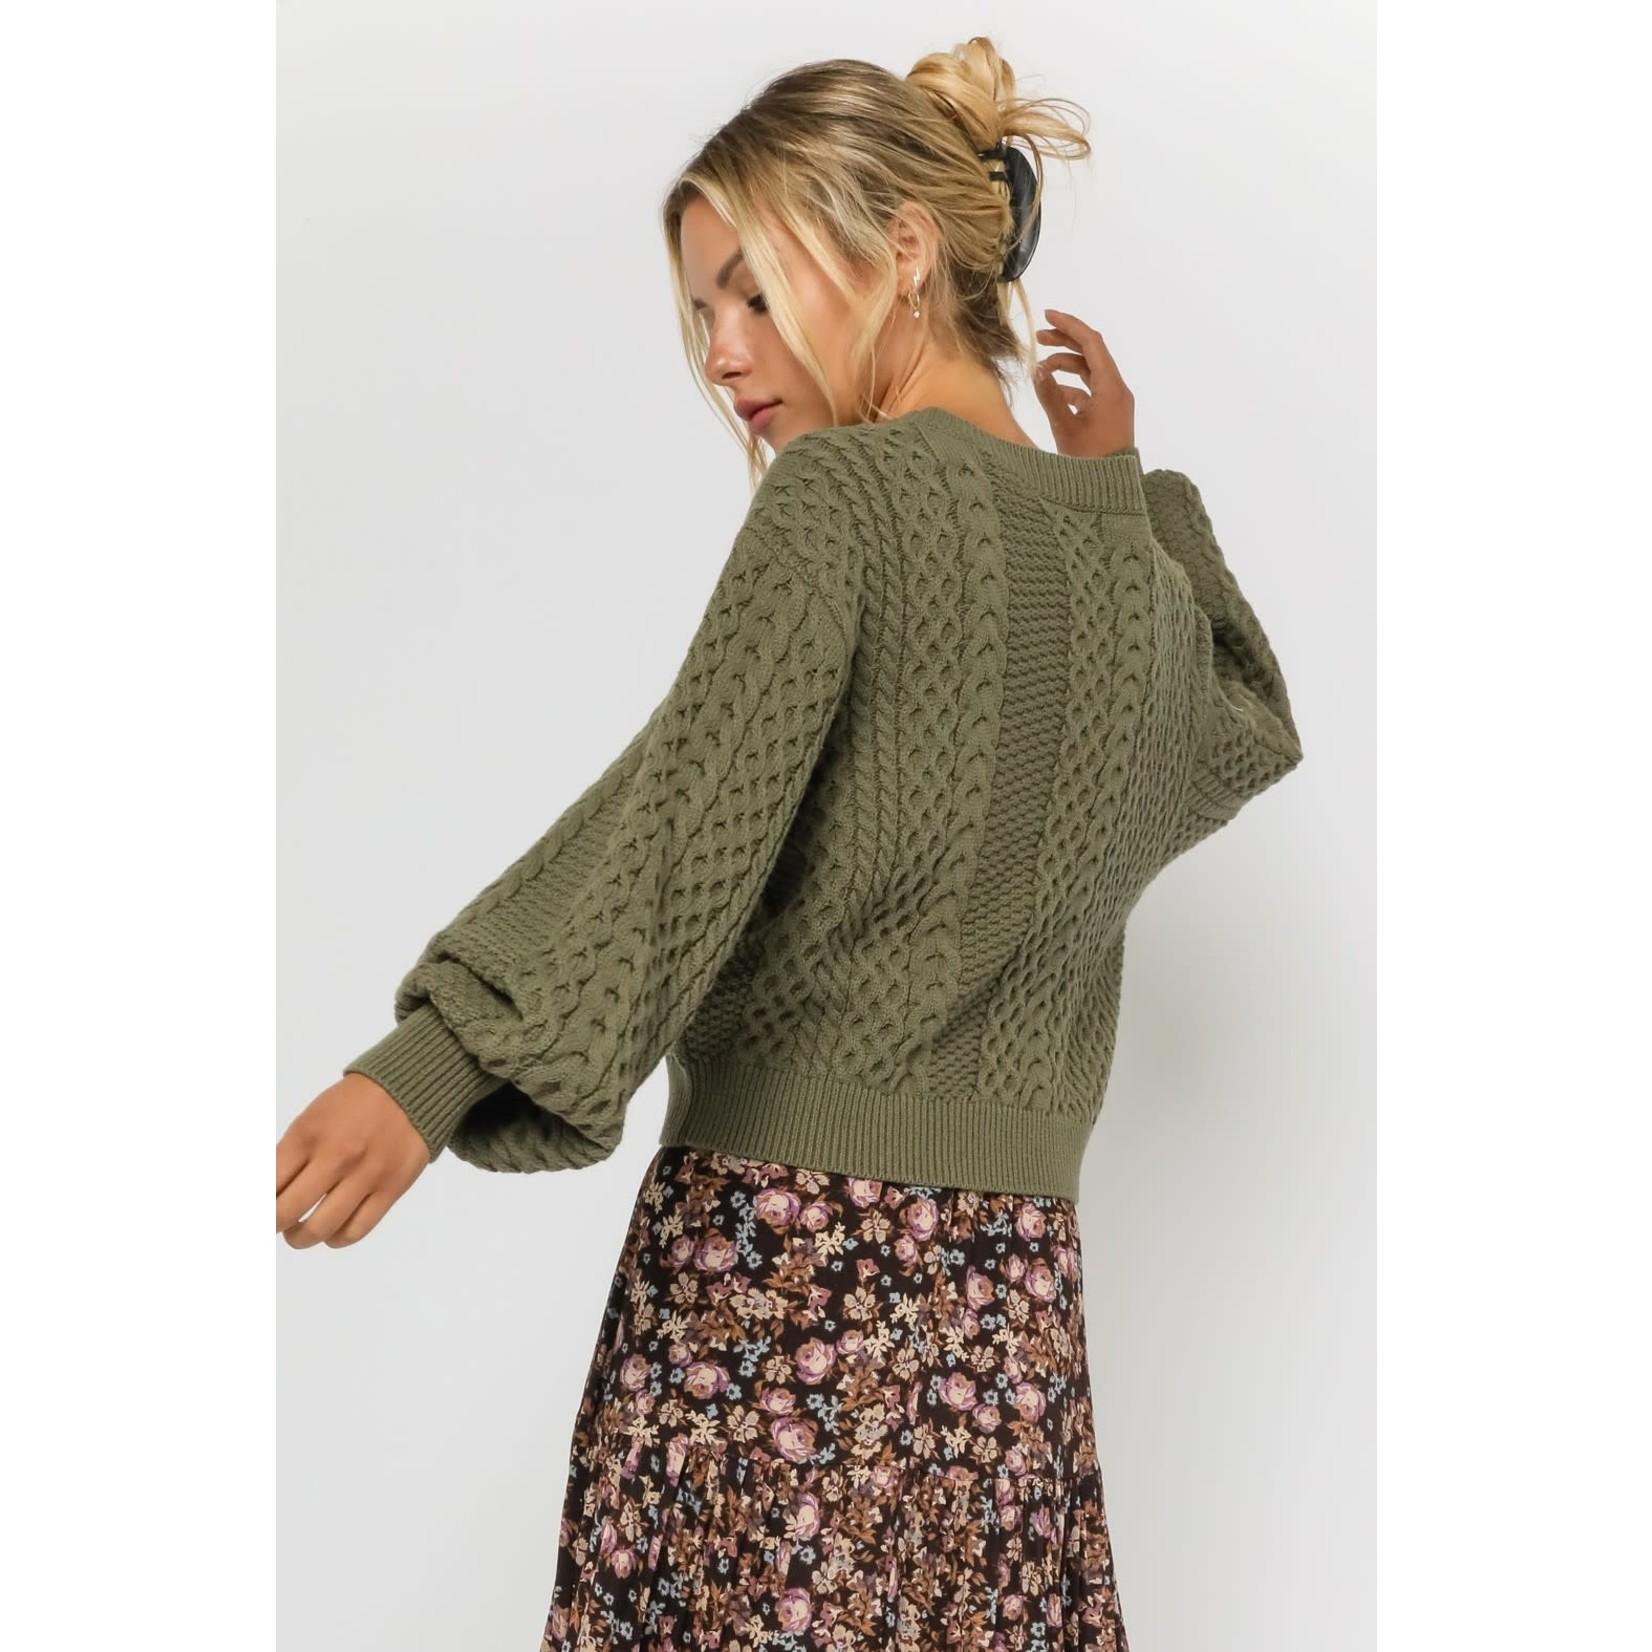 EM & ELLE Morris Fisherman Sweater